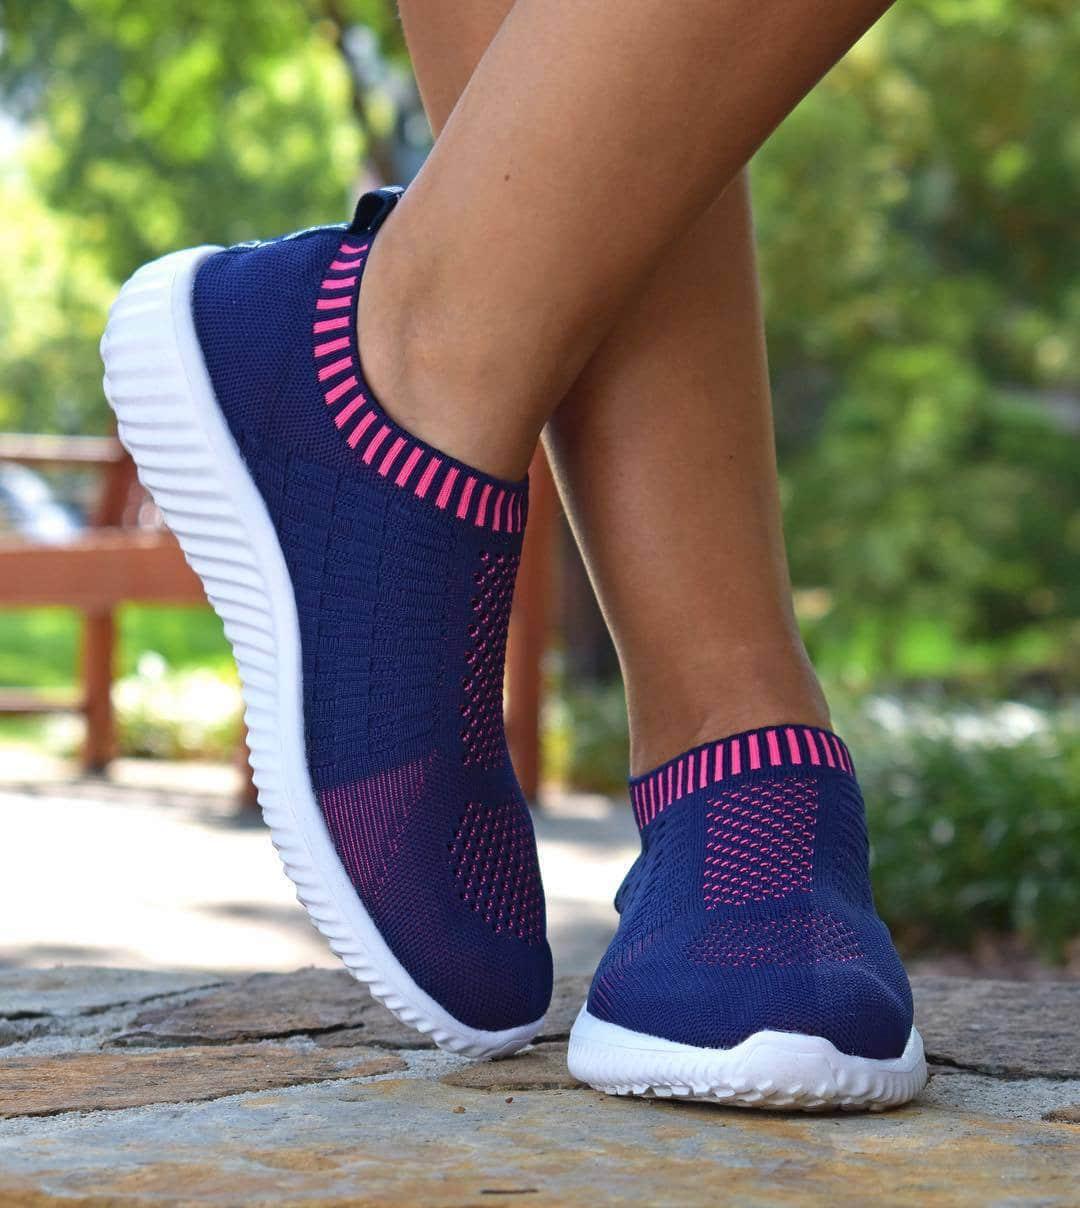 Comfy Best Walking Shoes